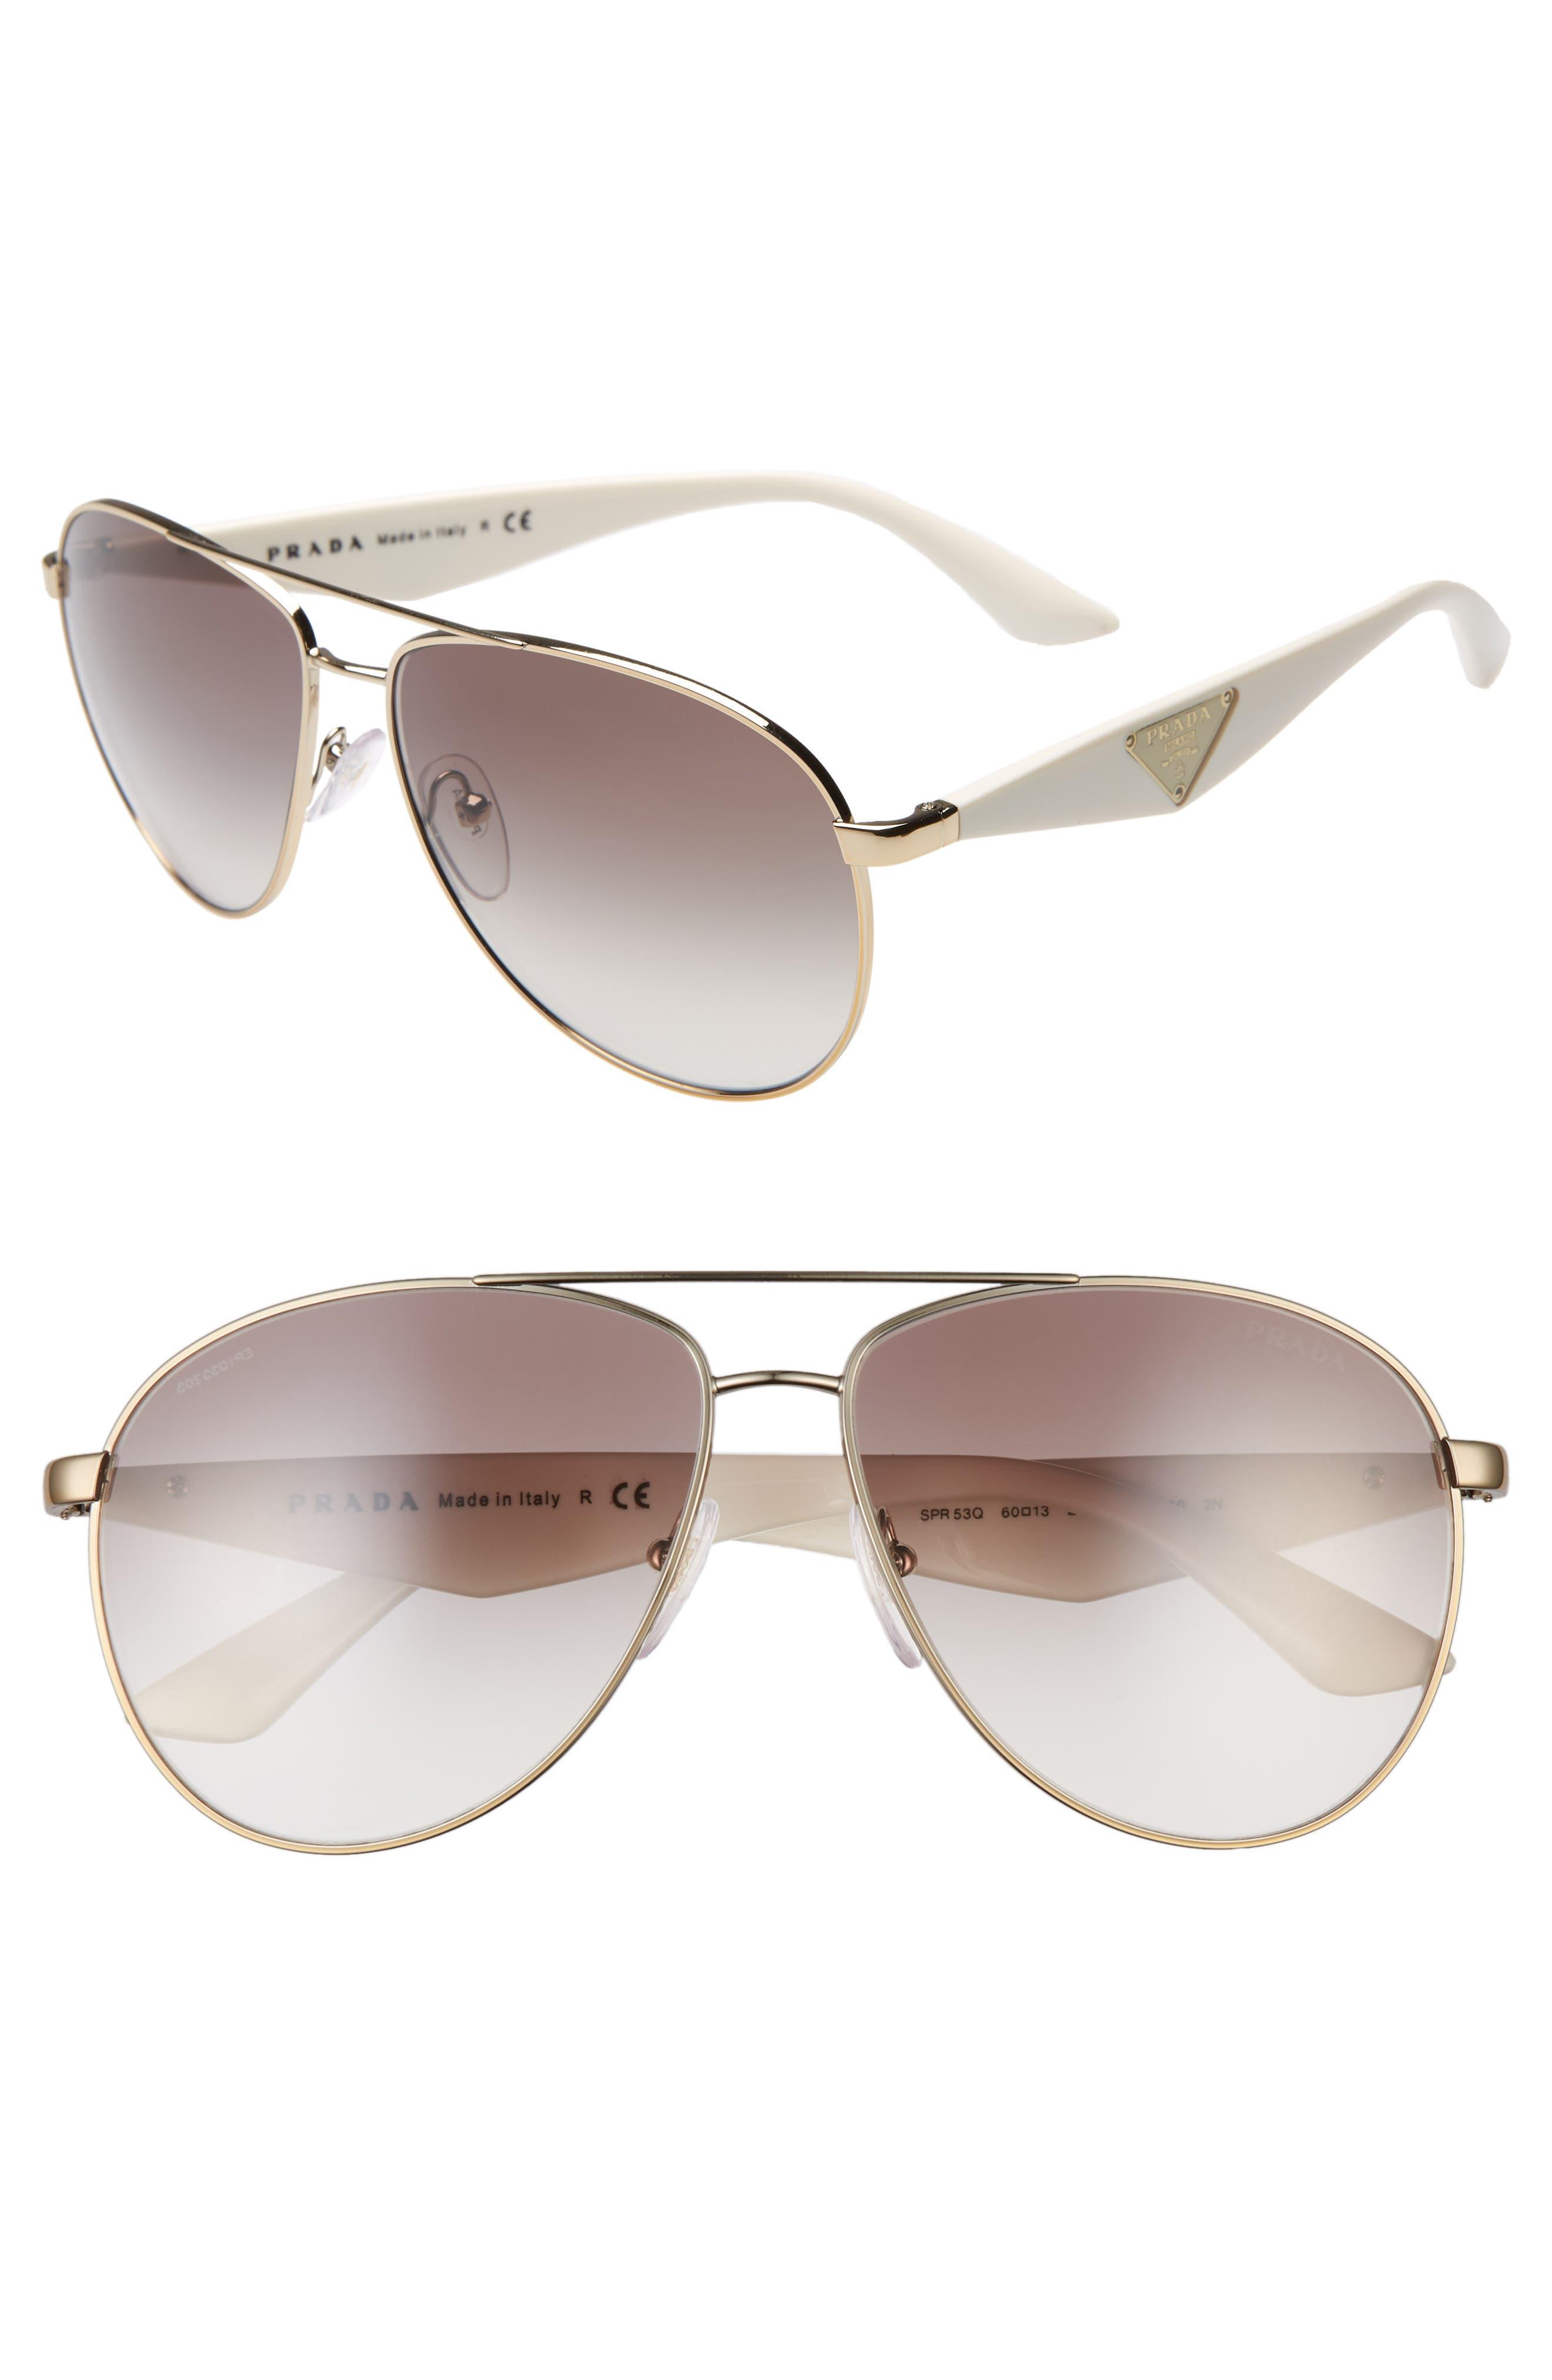 fbbeb71e8097 prada aviator sunglasses & eyewear for women - Buy best women's prada  aviator sunglasses & eyewear on Cools.com Shop